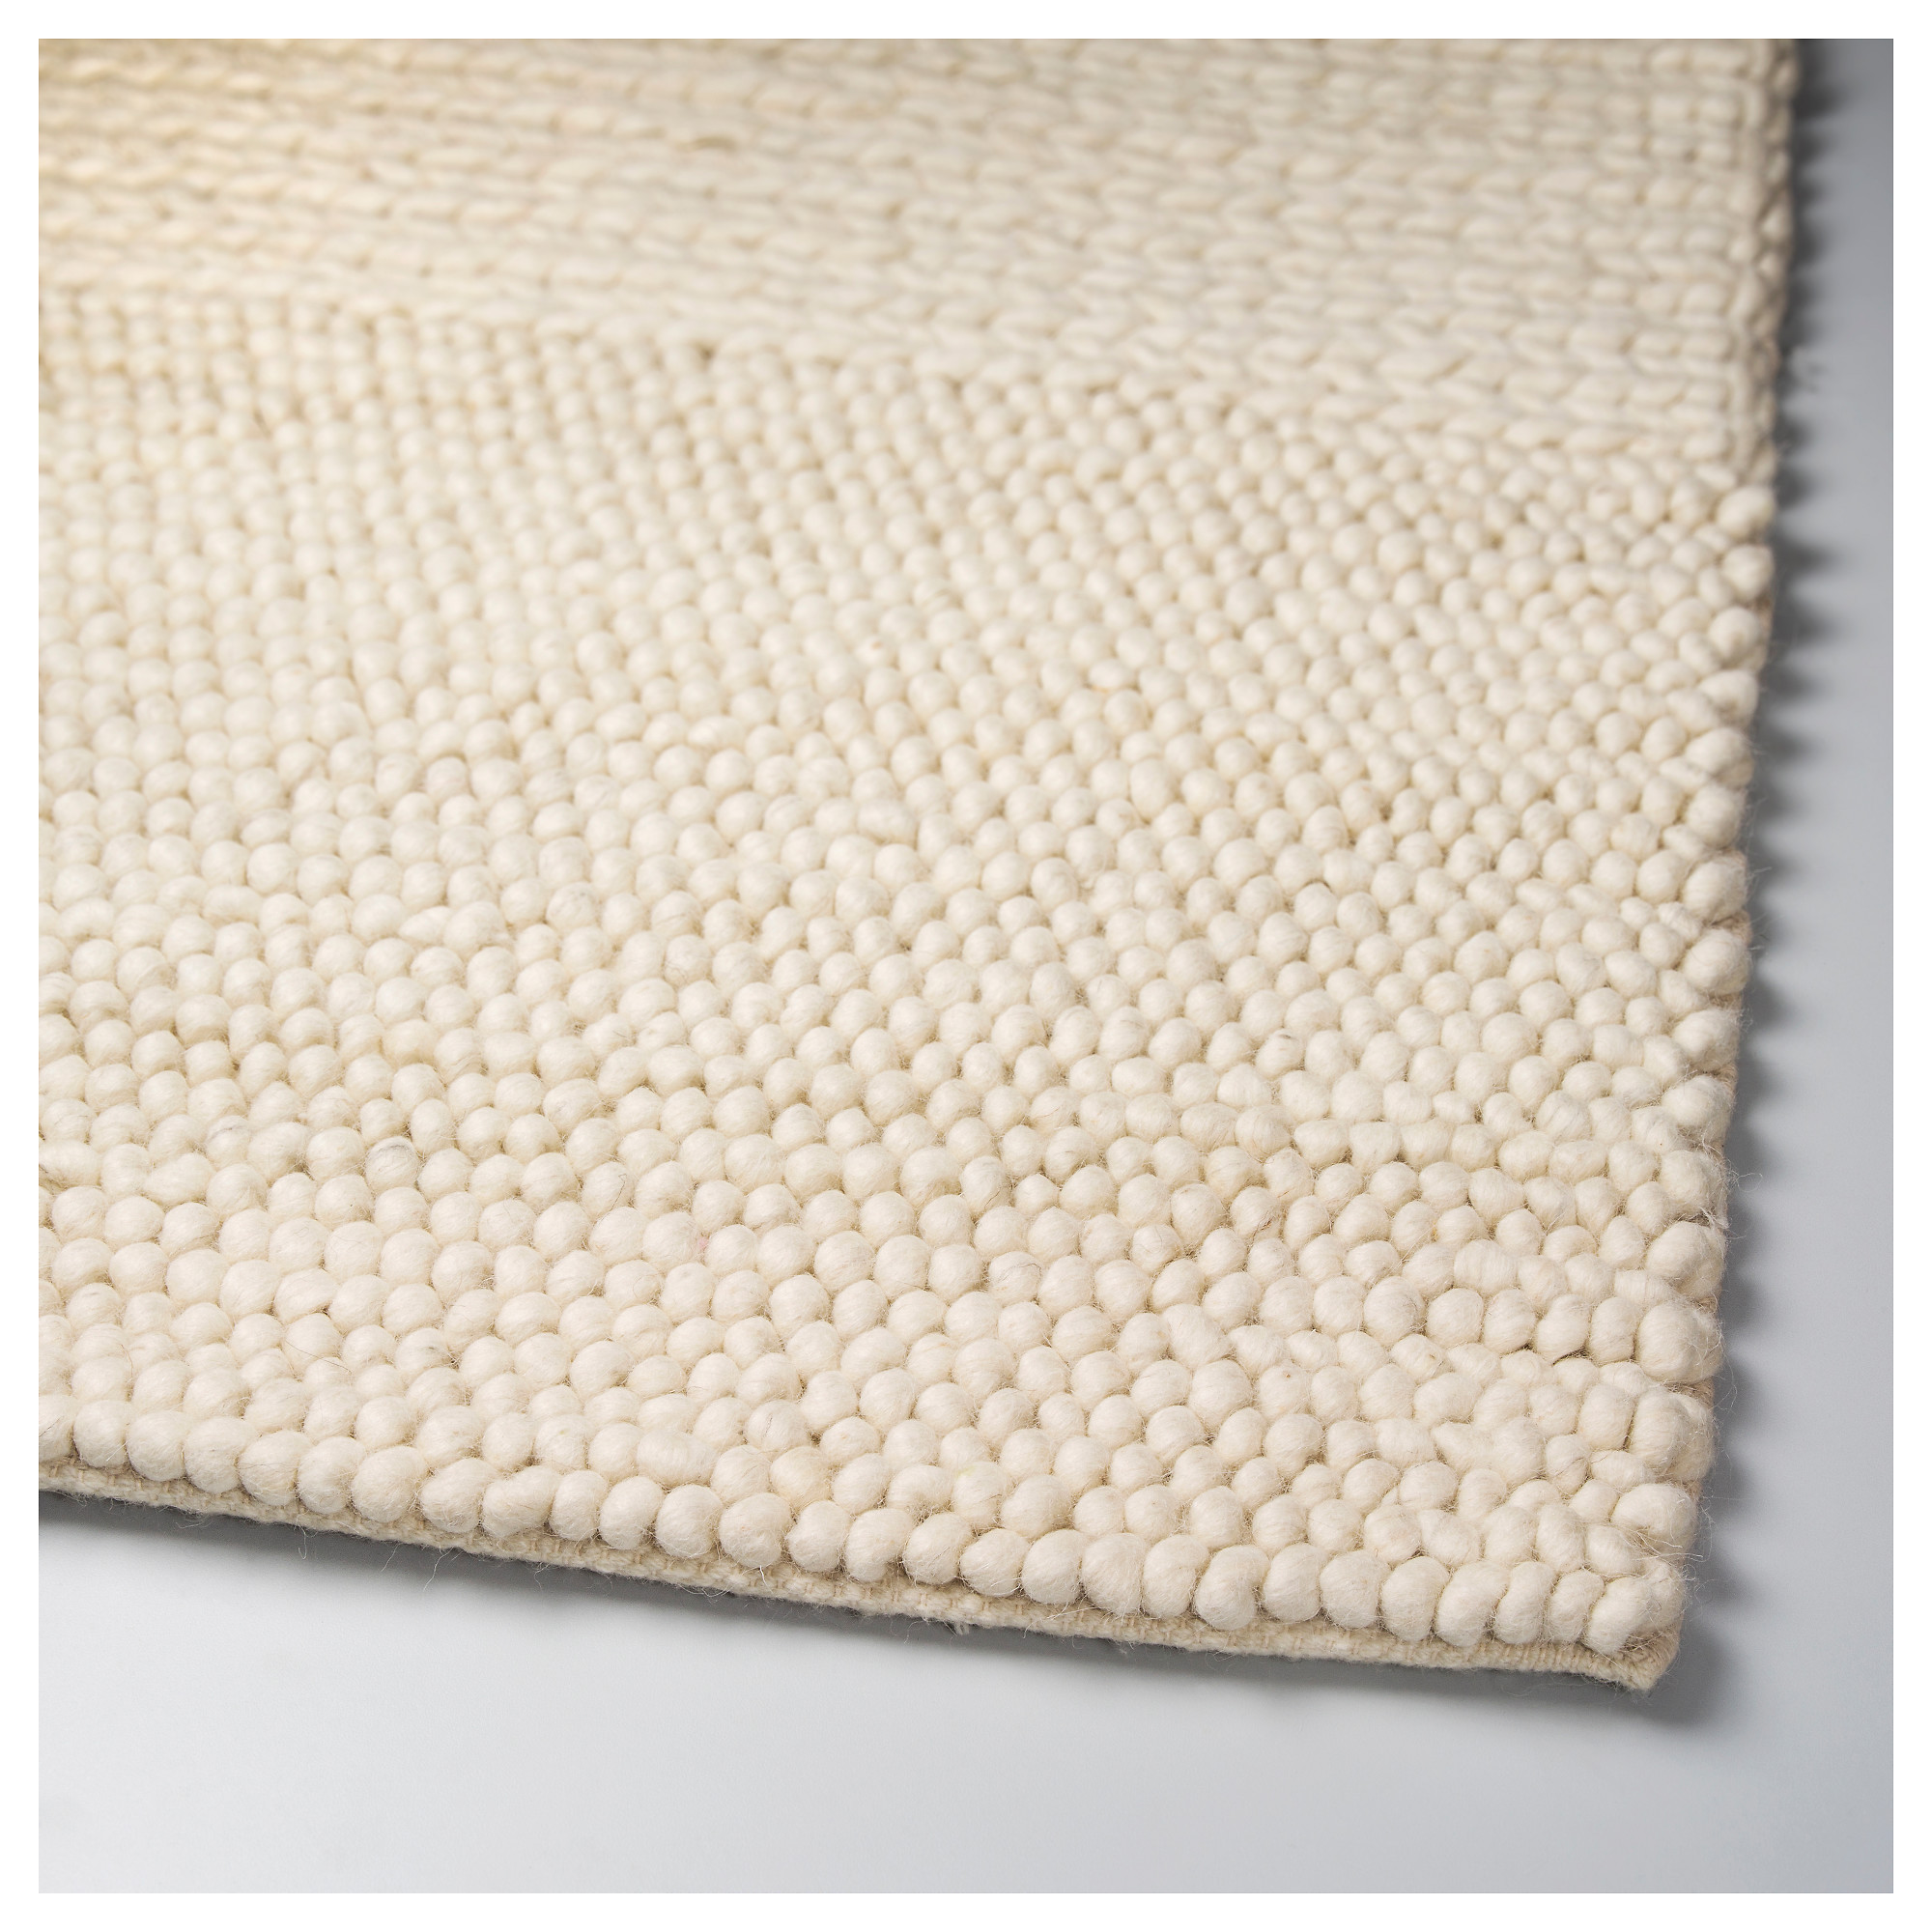 8×10 area Rugs at Ikea Ikea Ibsker Rug Off White Handmade Products Rugs Ikea